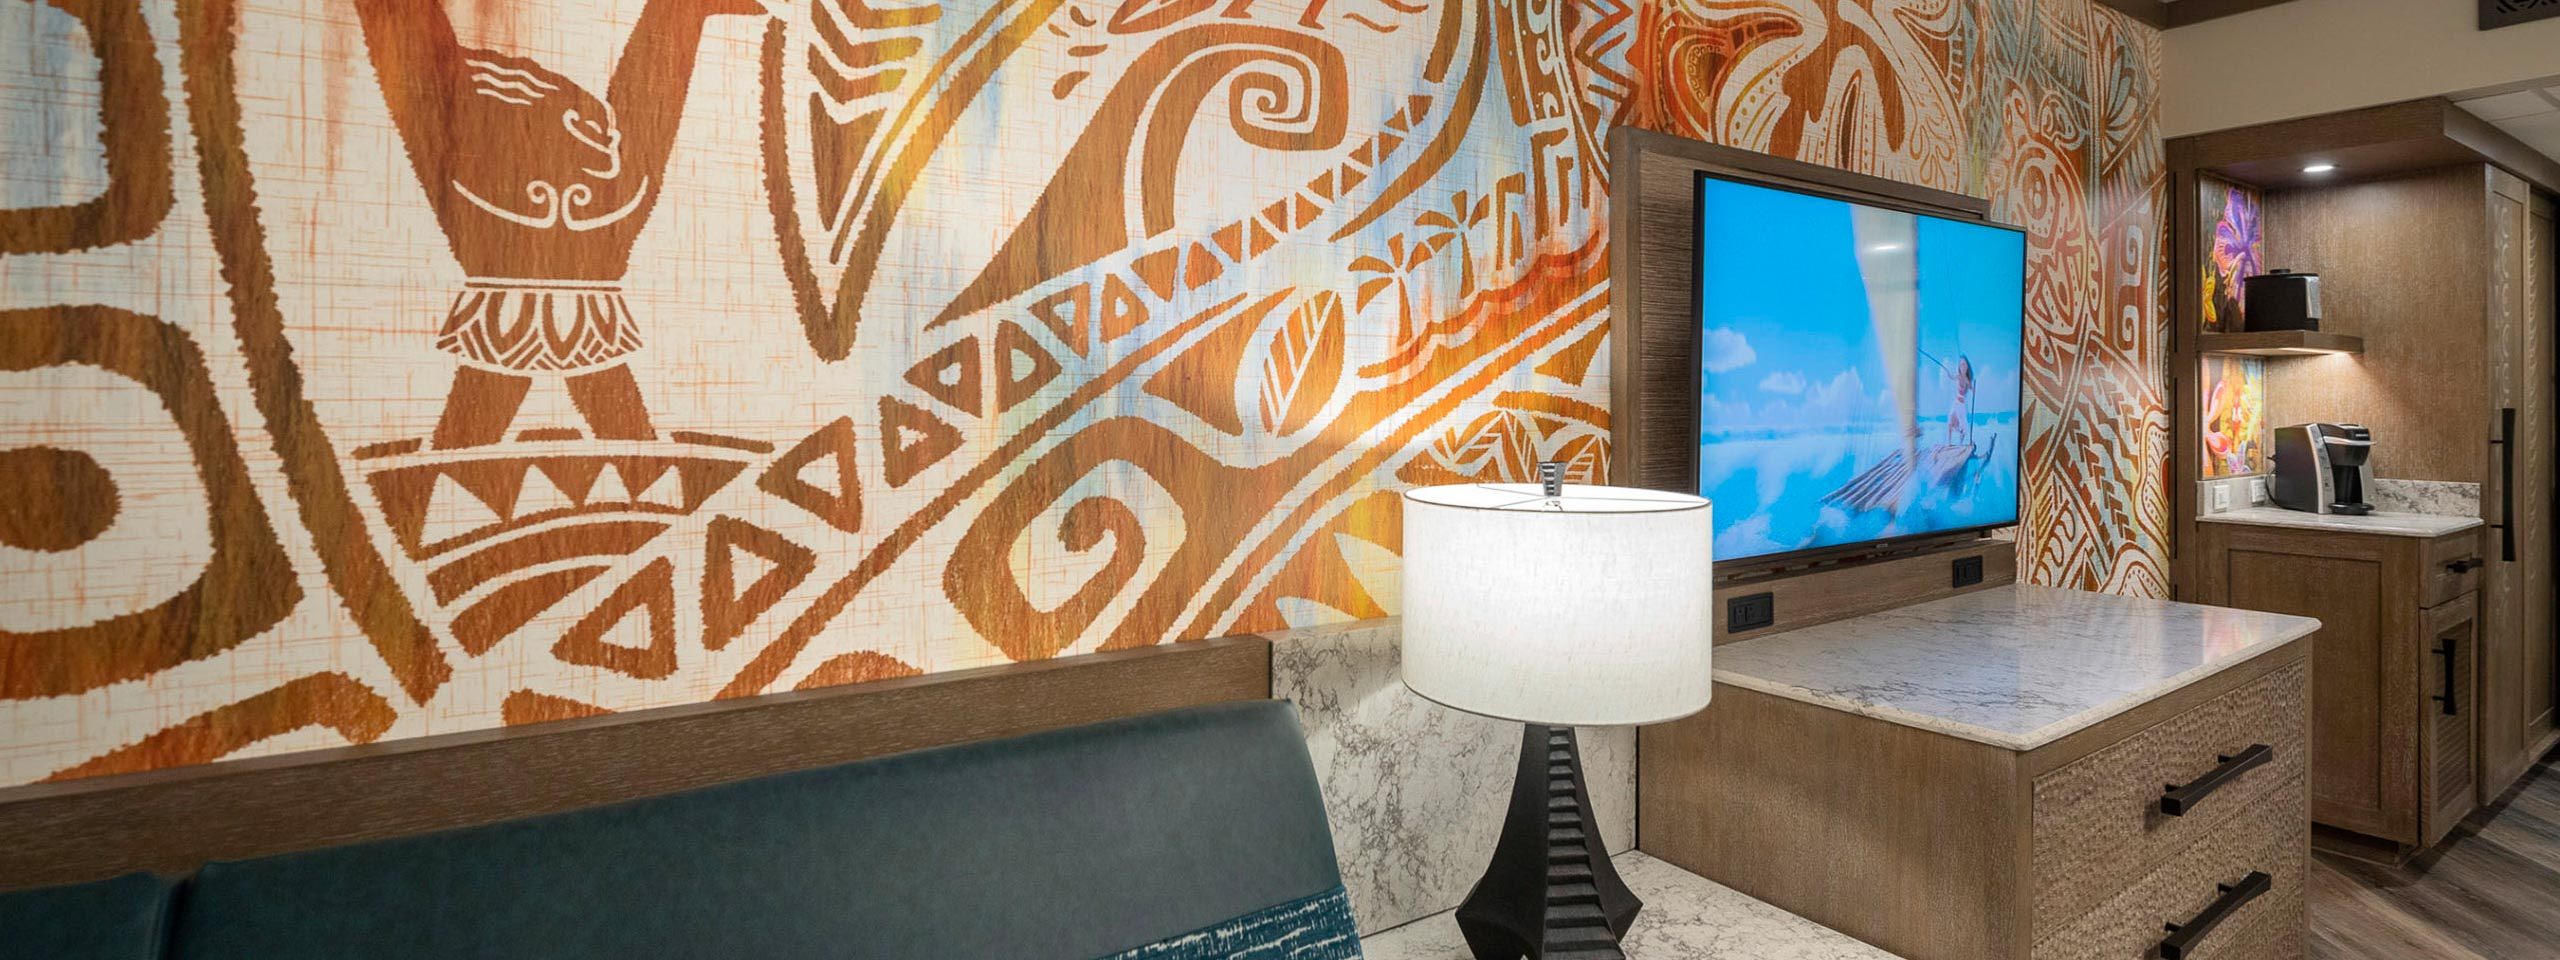 PHOTOS - Step inside a new Moana inspired room at Disney's Polynesian Village Resort